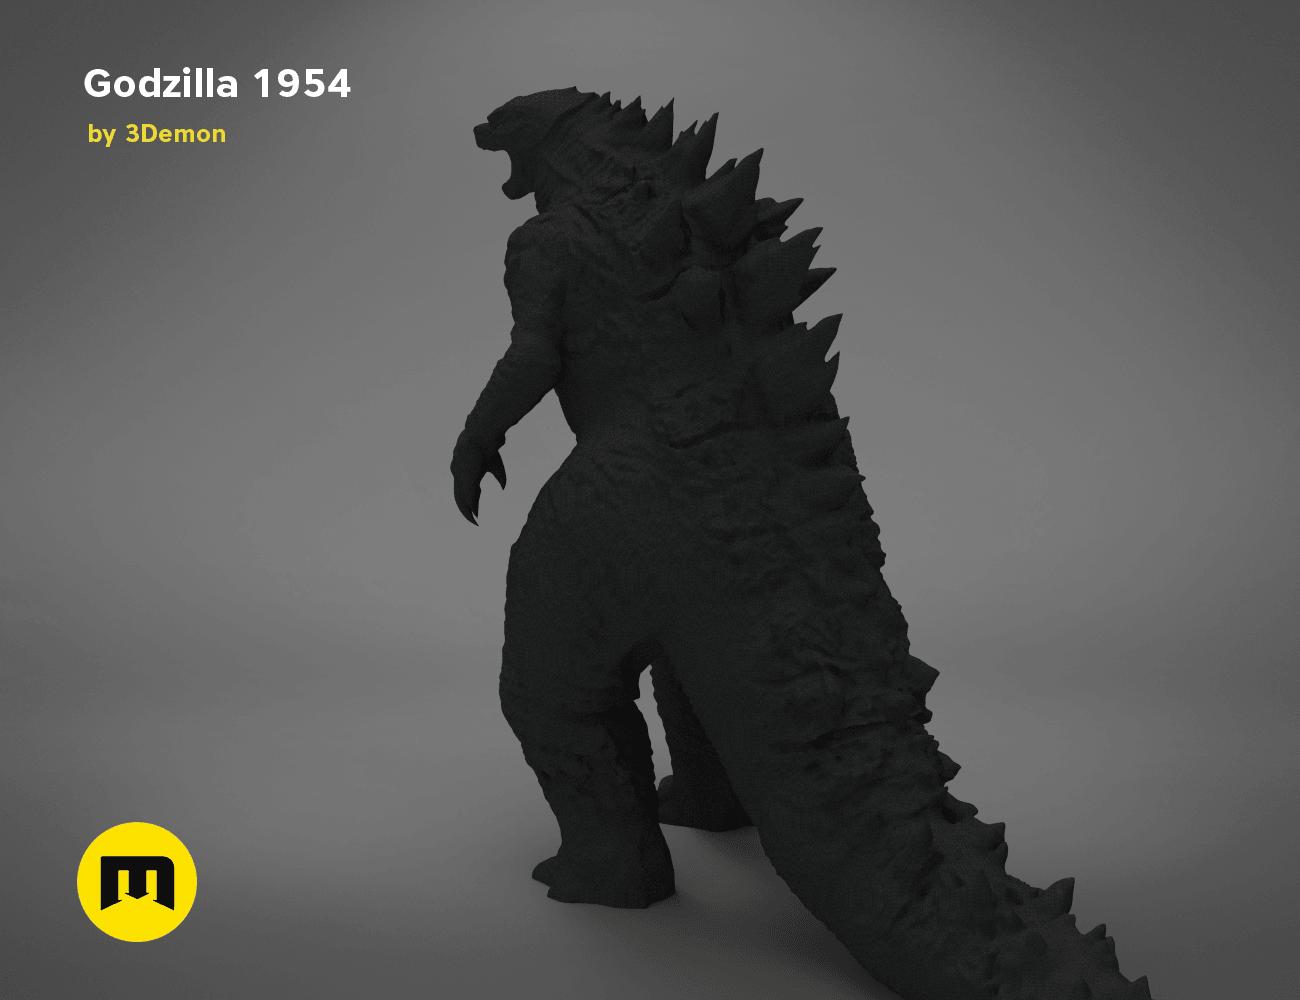 godzilla-black-japanese-bottom.201.png Download free OBJ file Godzilla 1954 figure and bottle opener • 3D printer model, 3D-mon